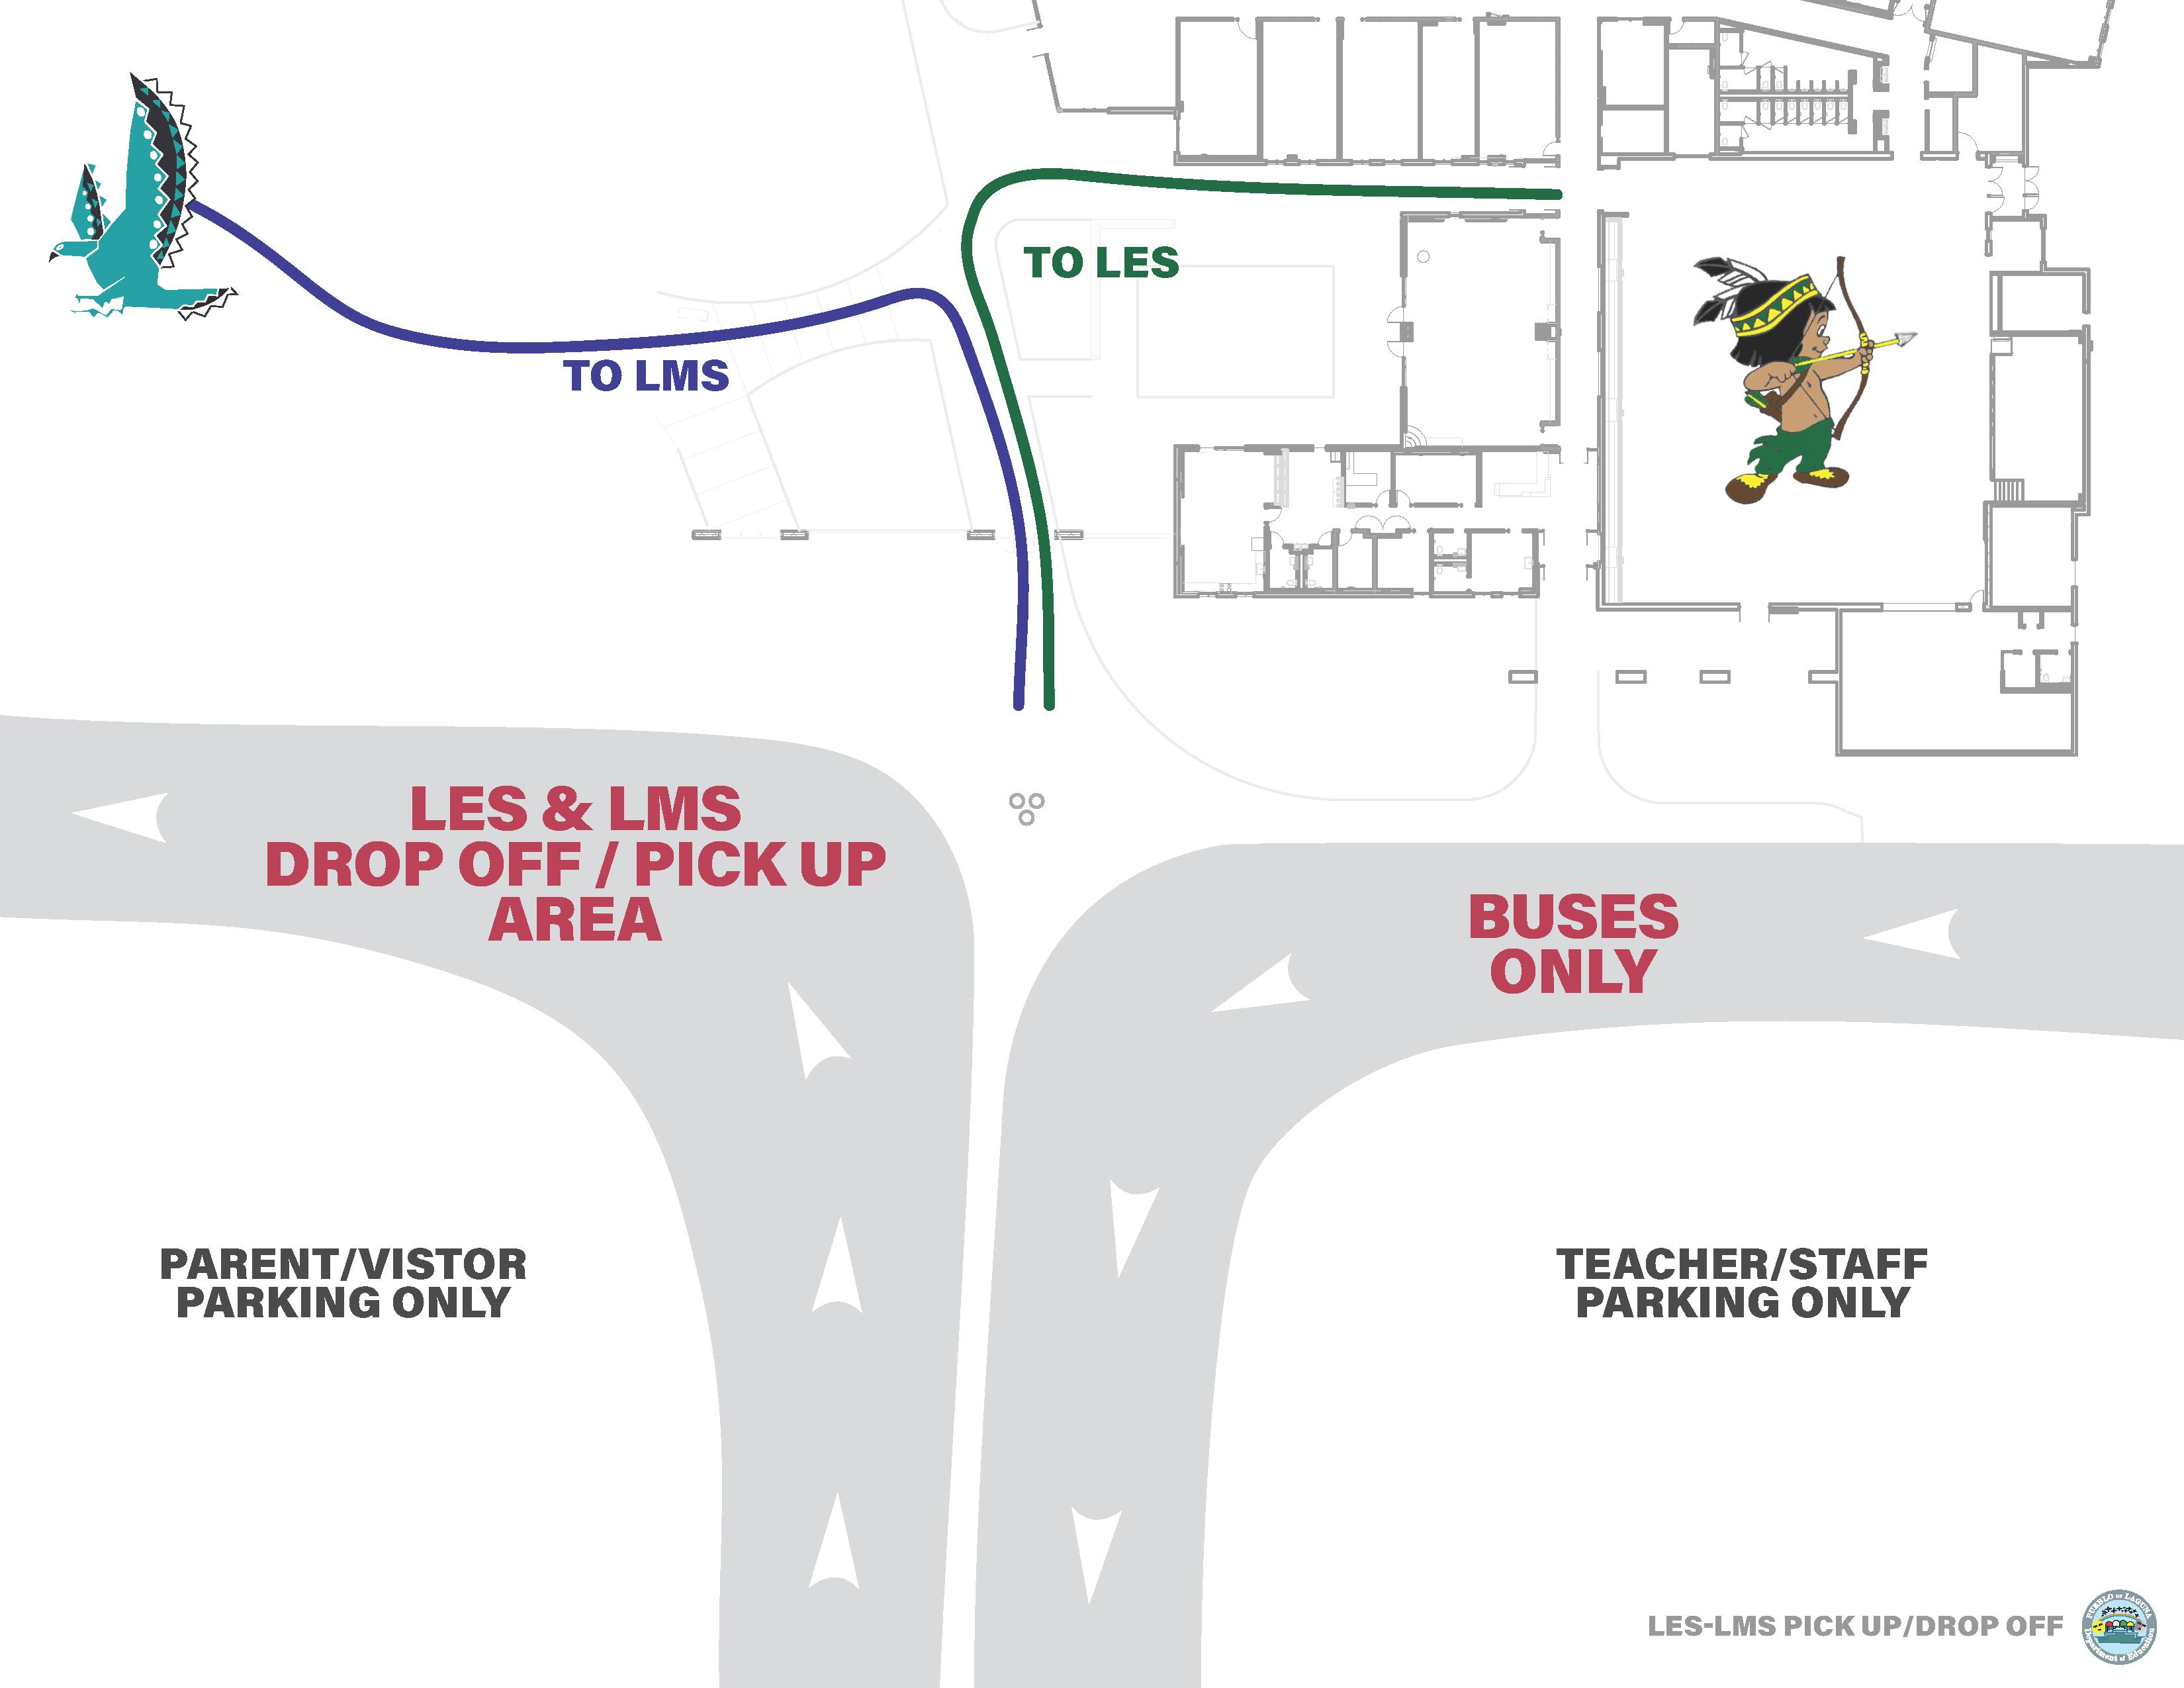 LES/LMS Student Drop-Off/Pick-Up Area